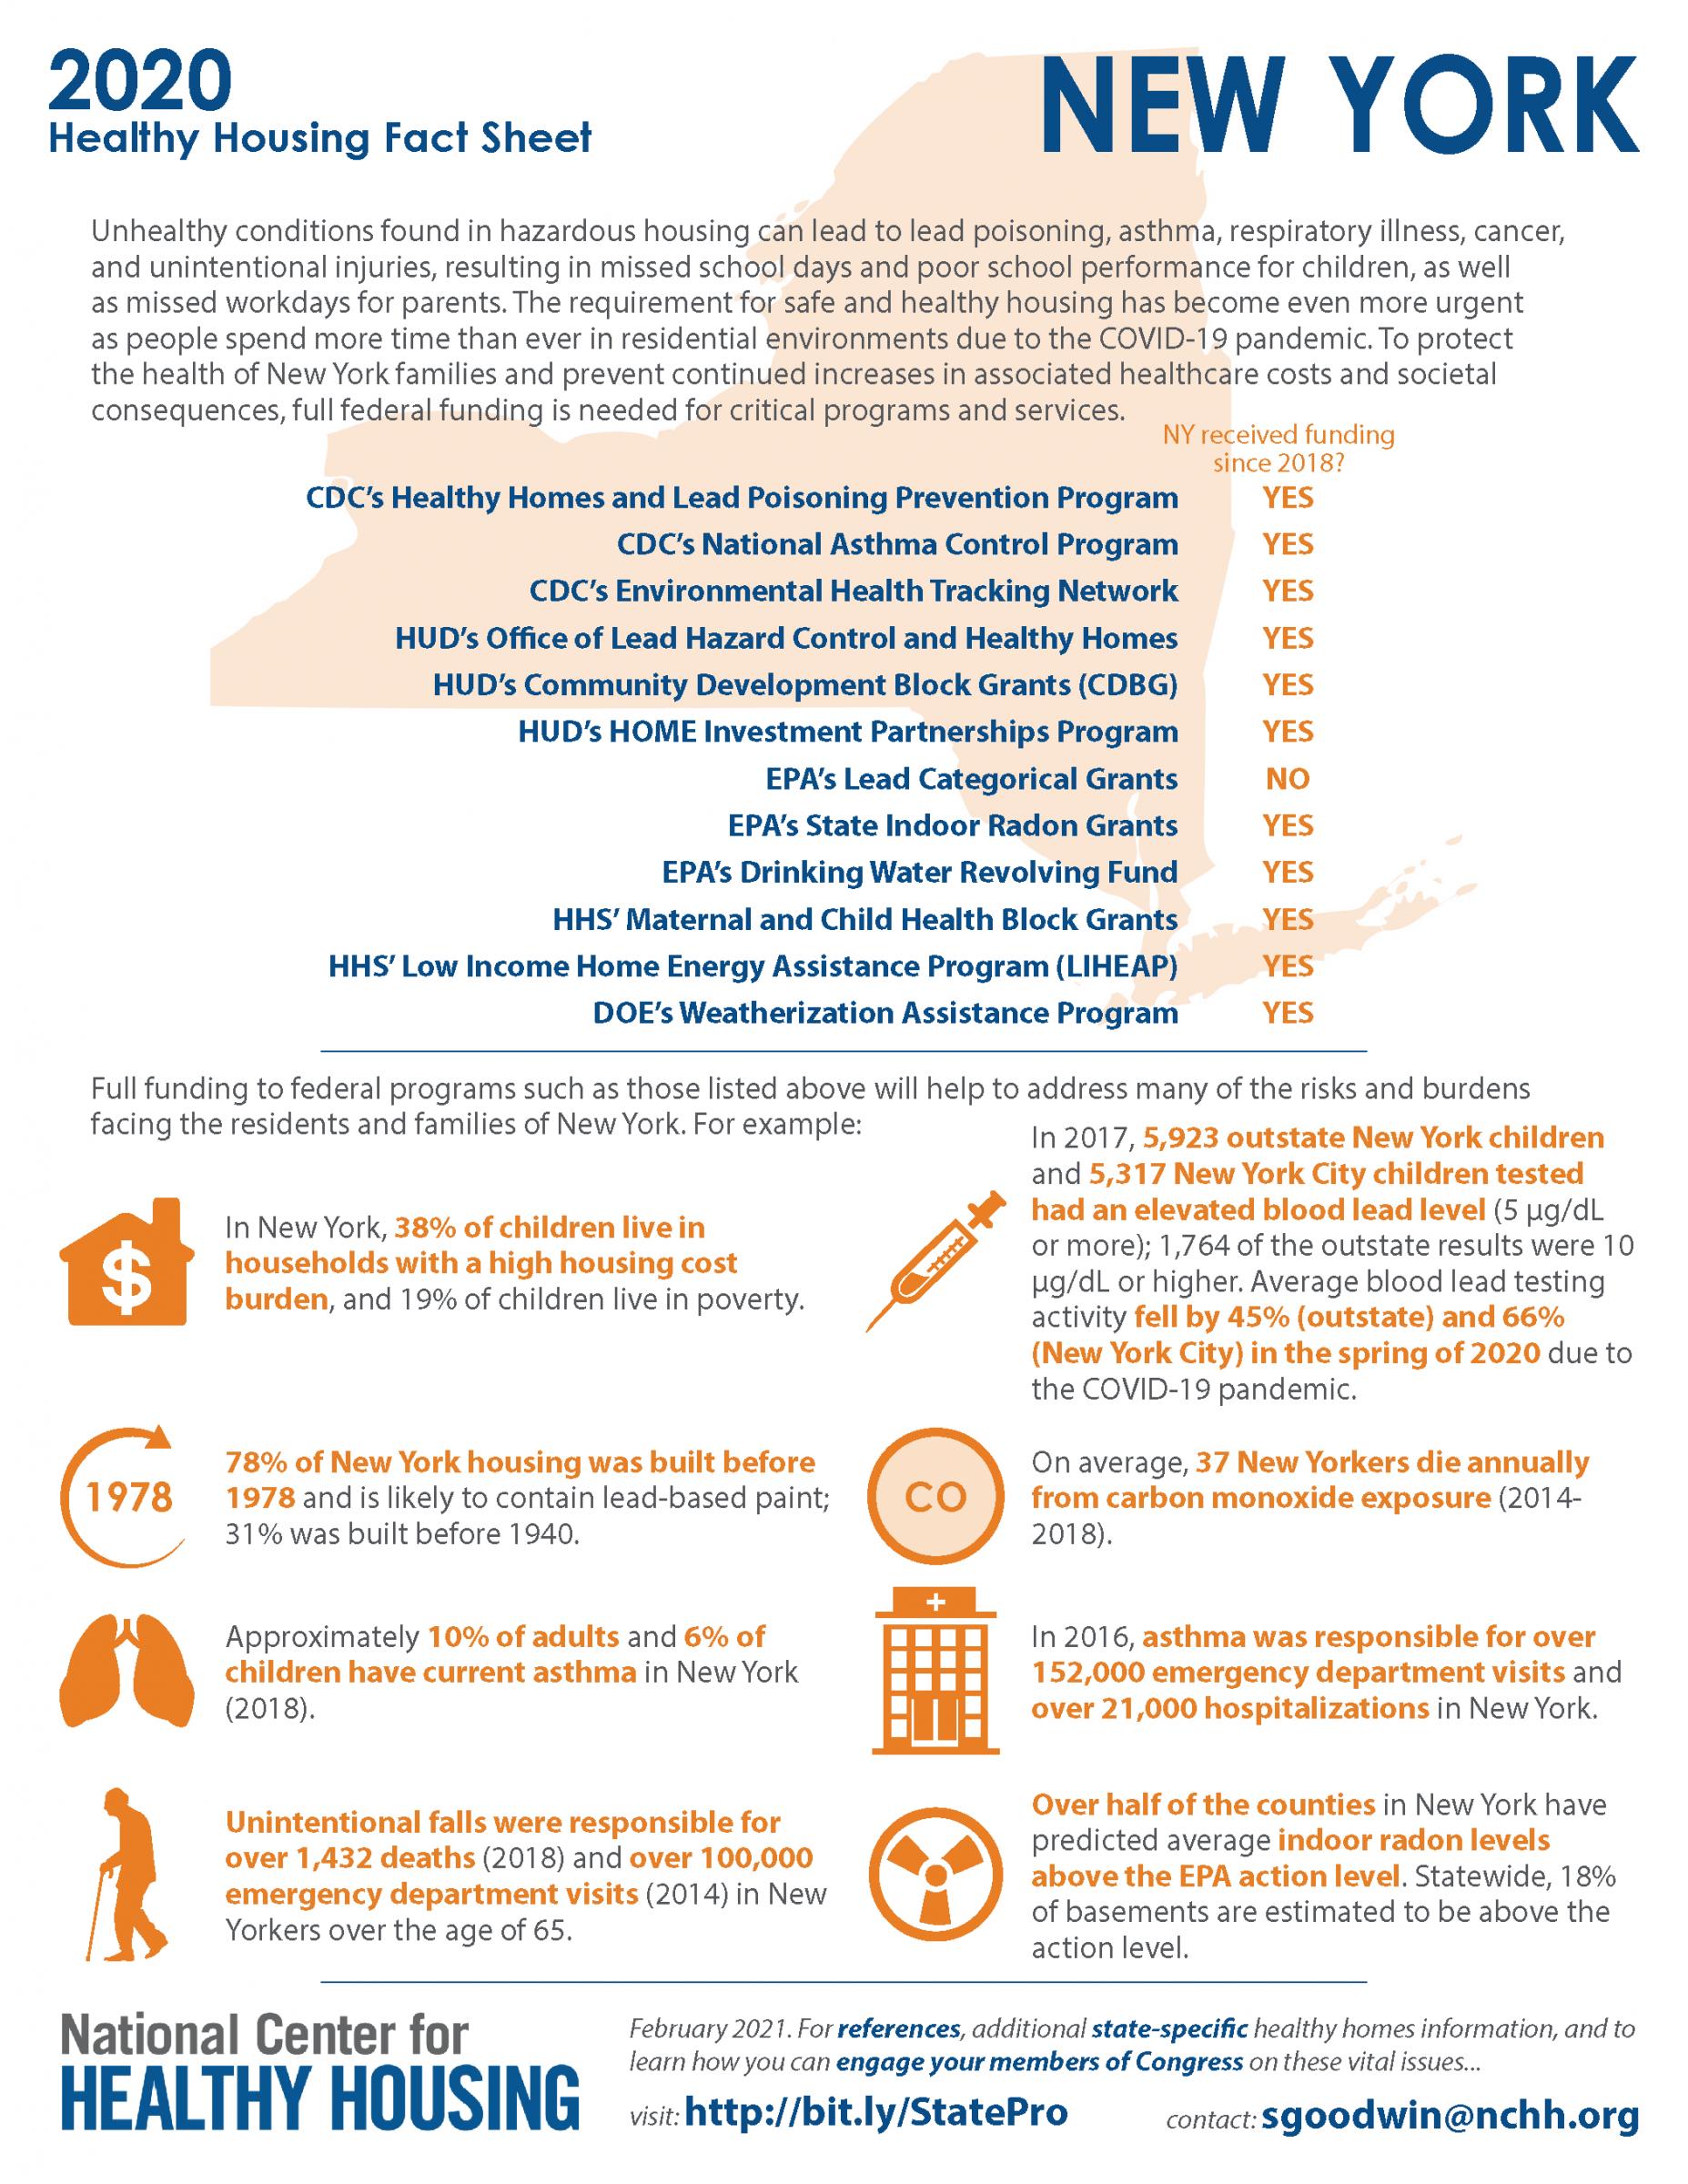 Healthy Housing Fact Sheet - New York 2020